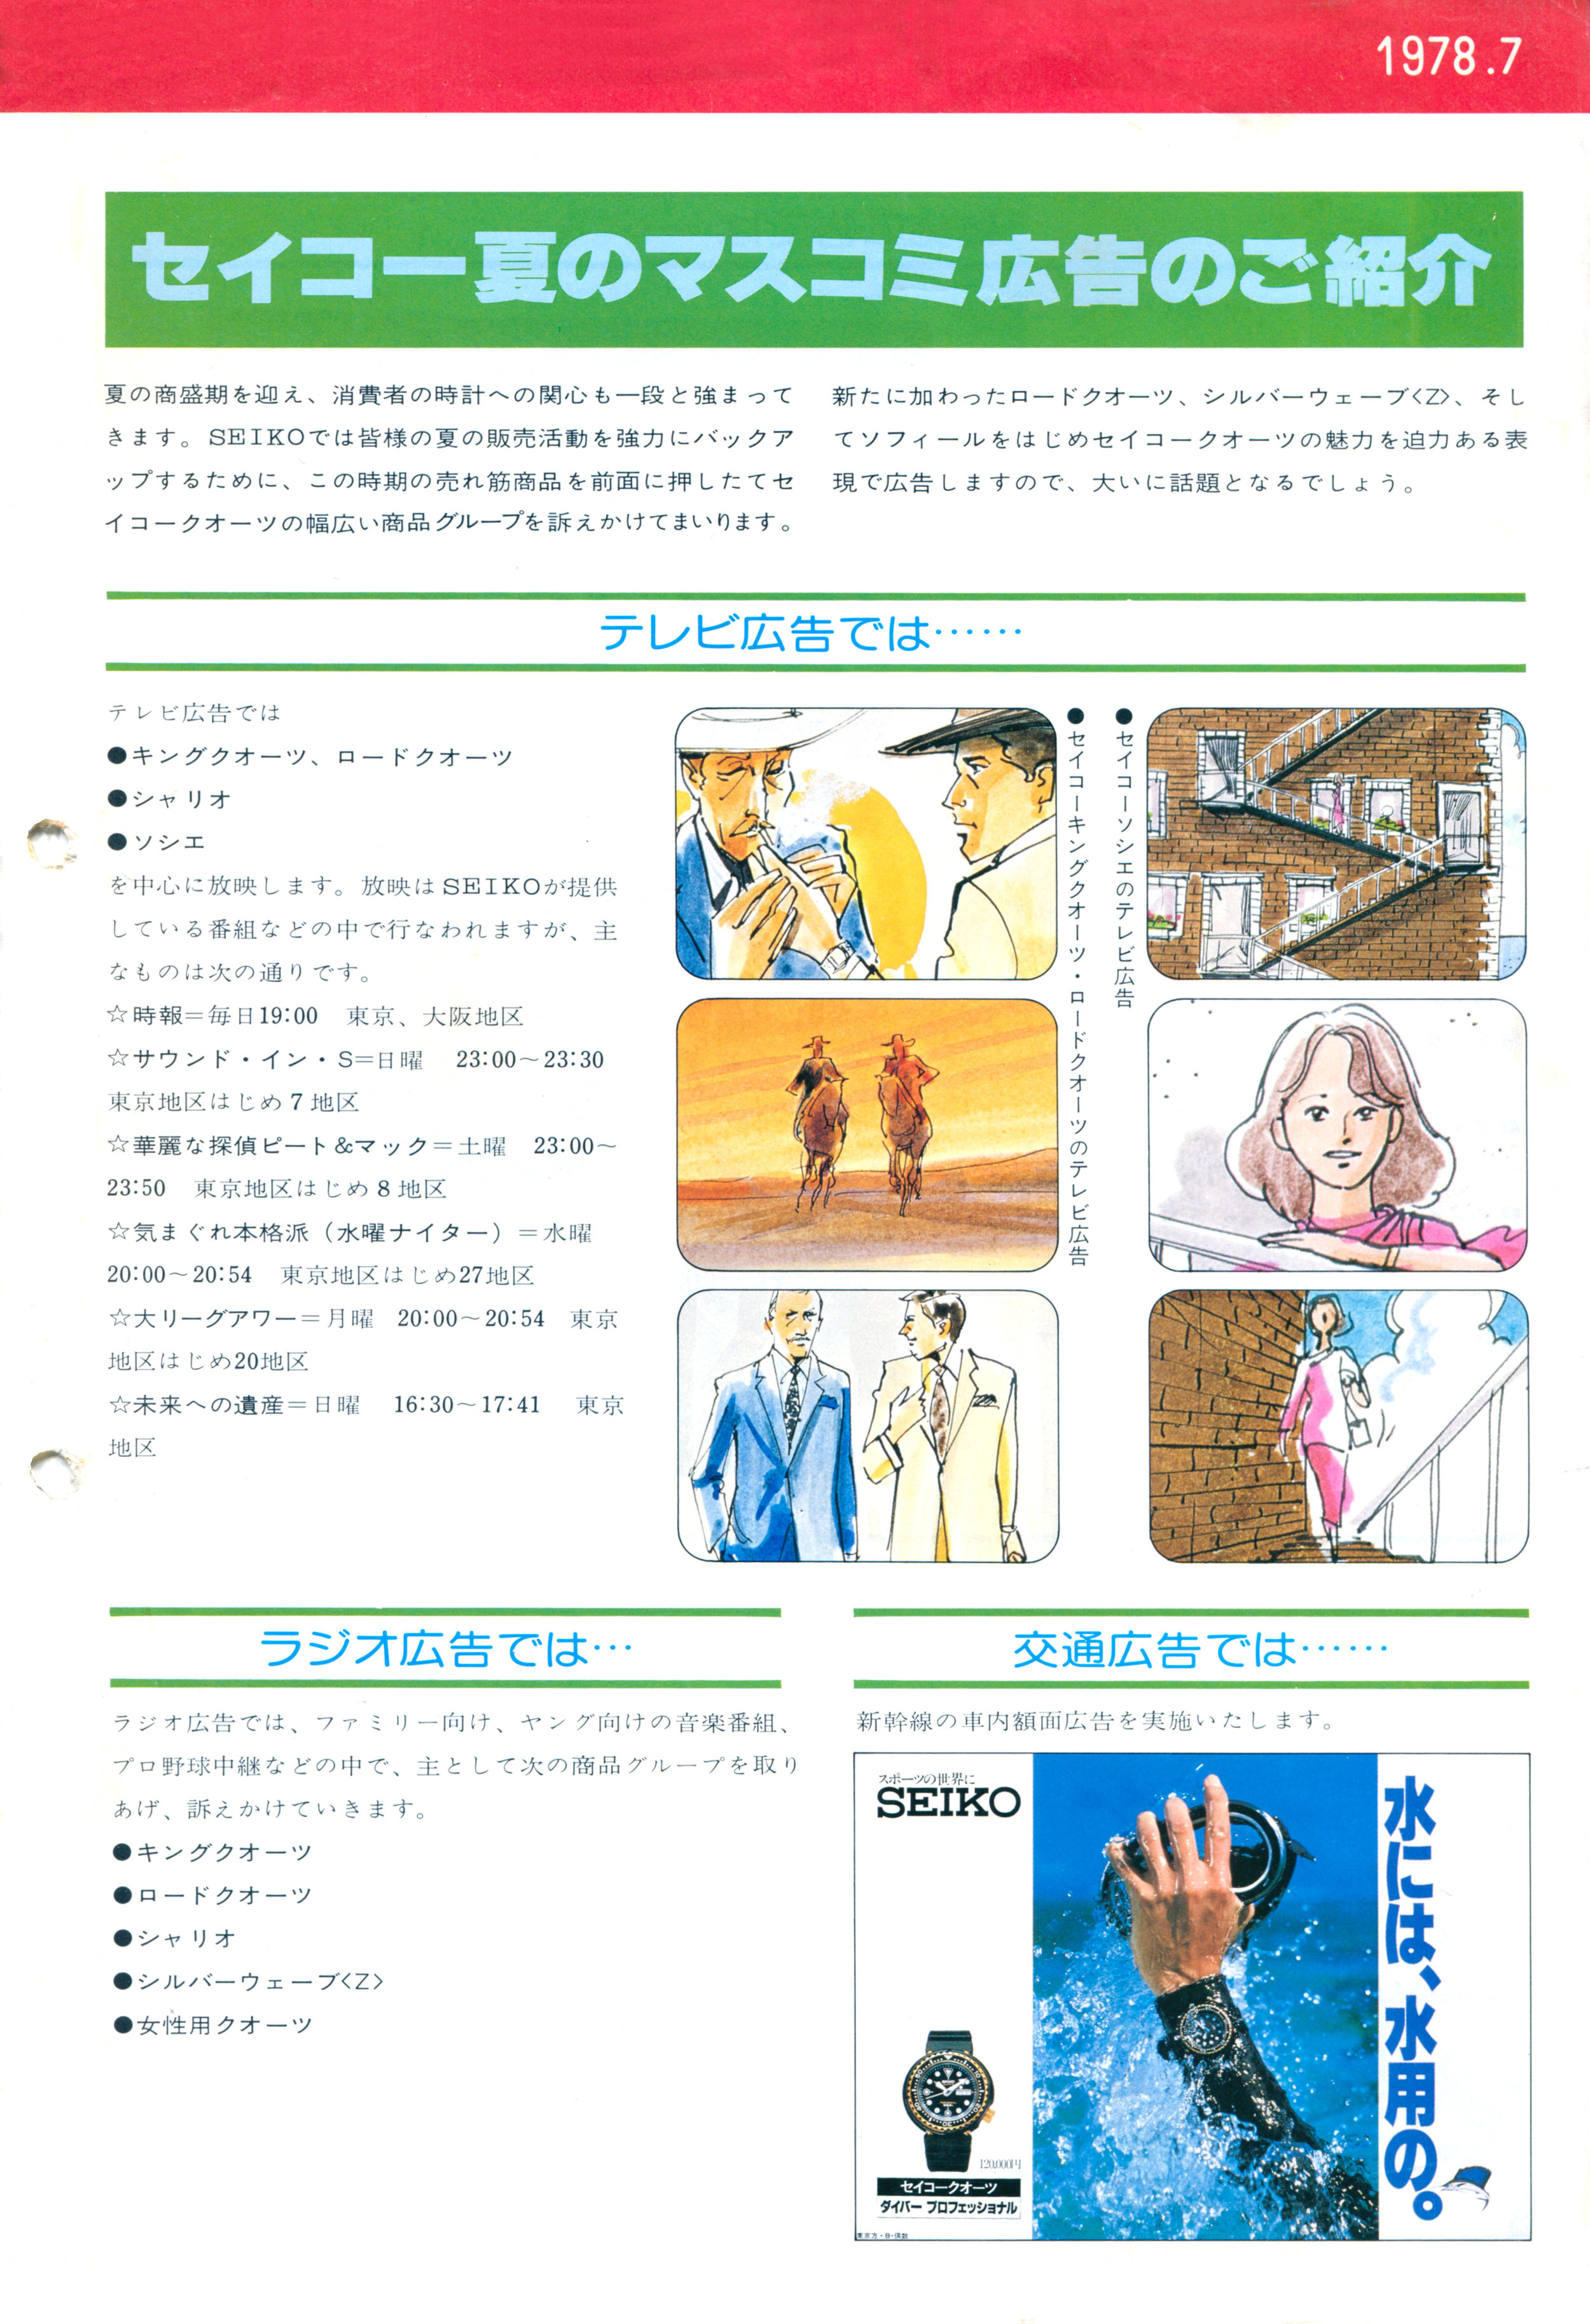 Seiko News 1978-7